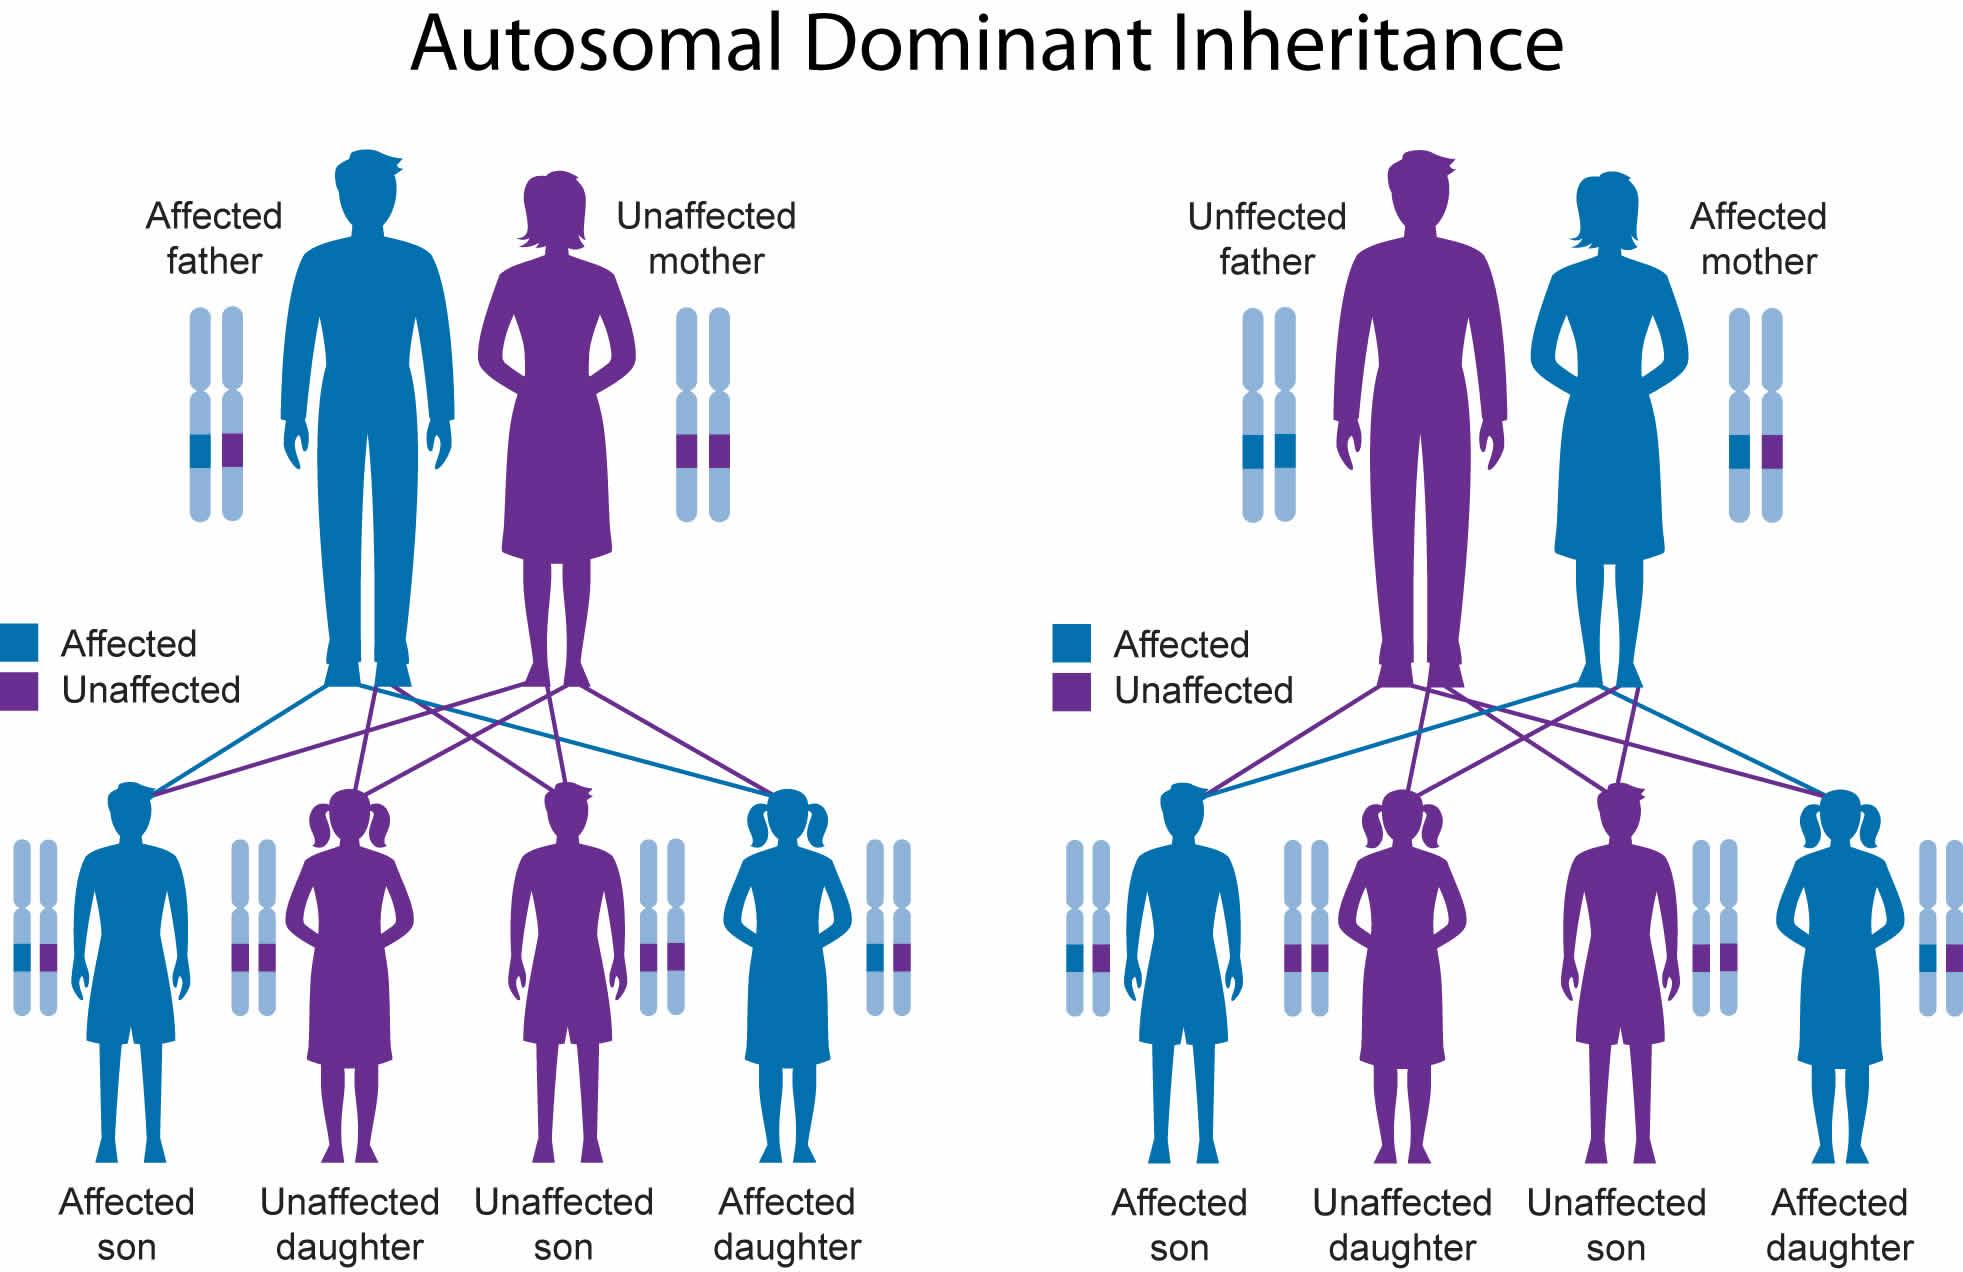 Waardenburg syndrome autosomal dominant inheritance pattern